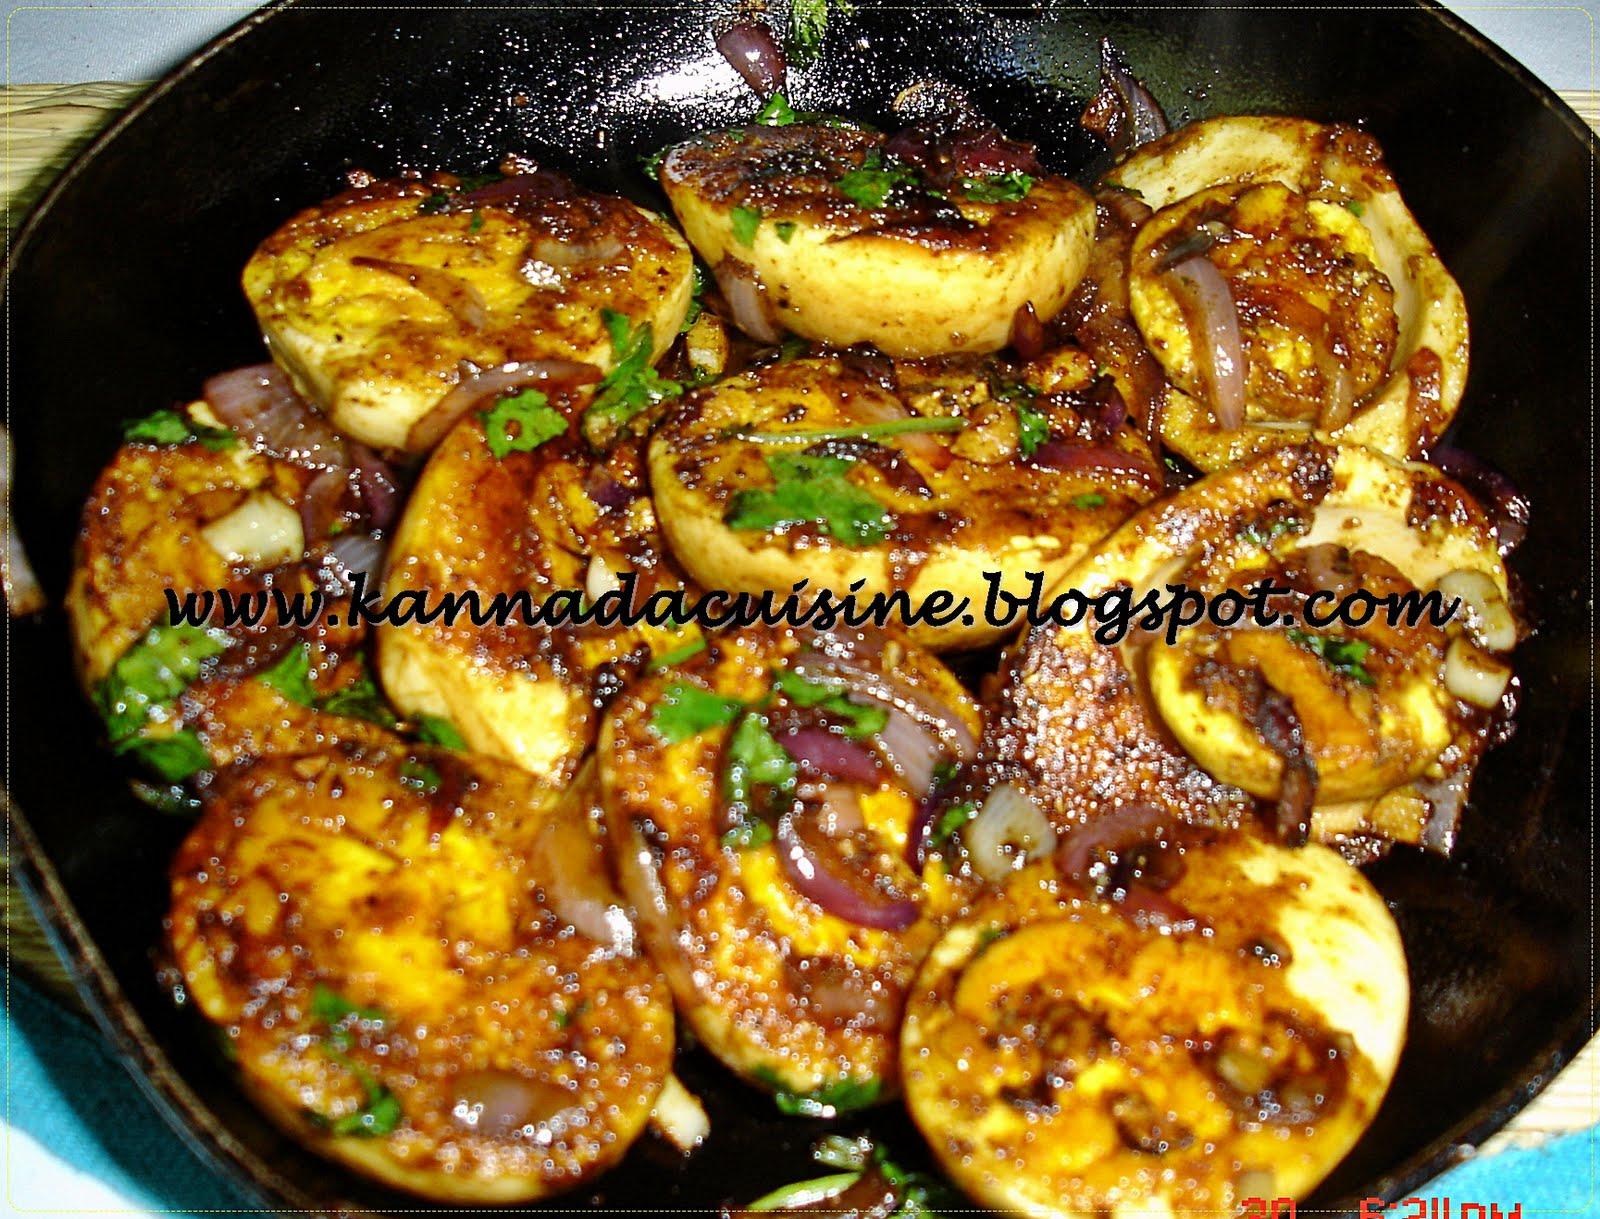 Kannada cuisine chilli egg kannada cuisine forumfinder Image collections